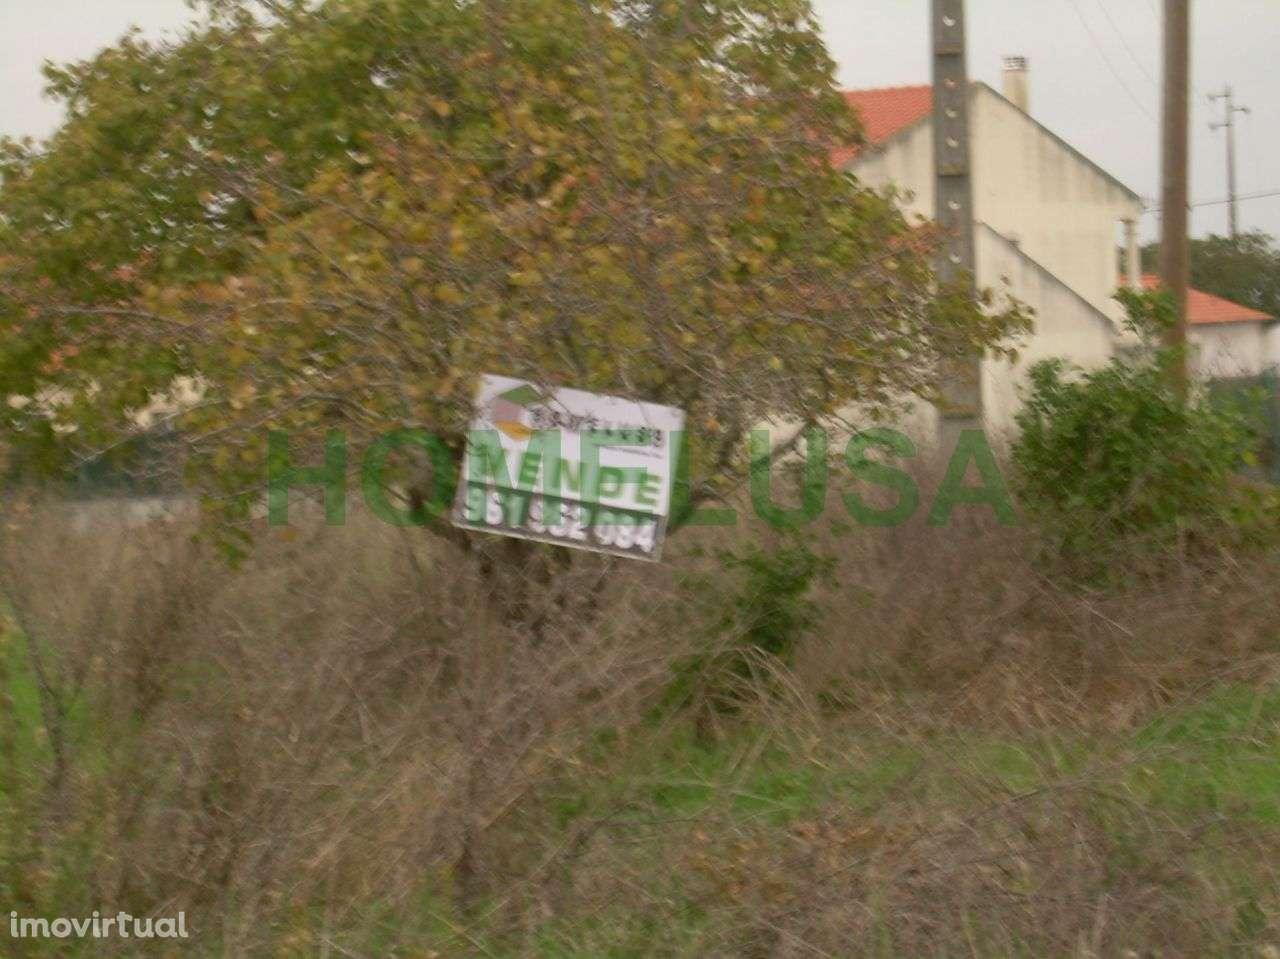 Terreno para comprar, Lavos, Coimbra - Foto 10